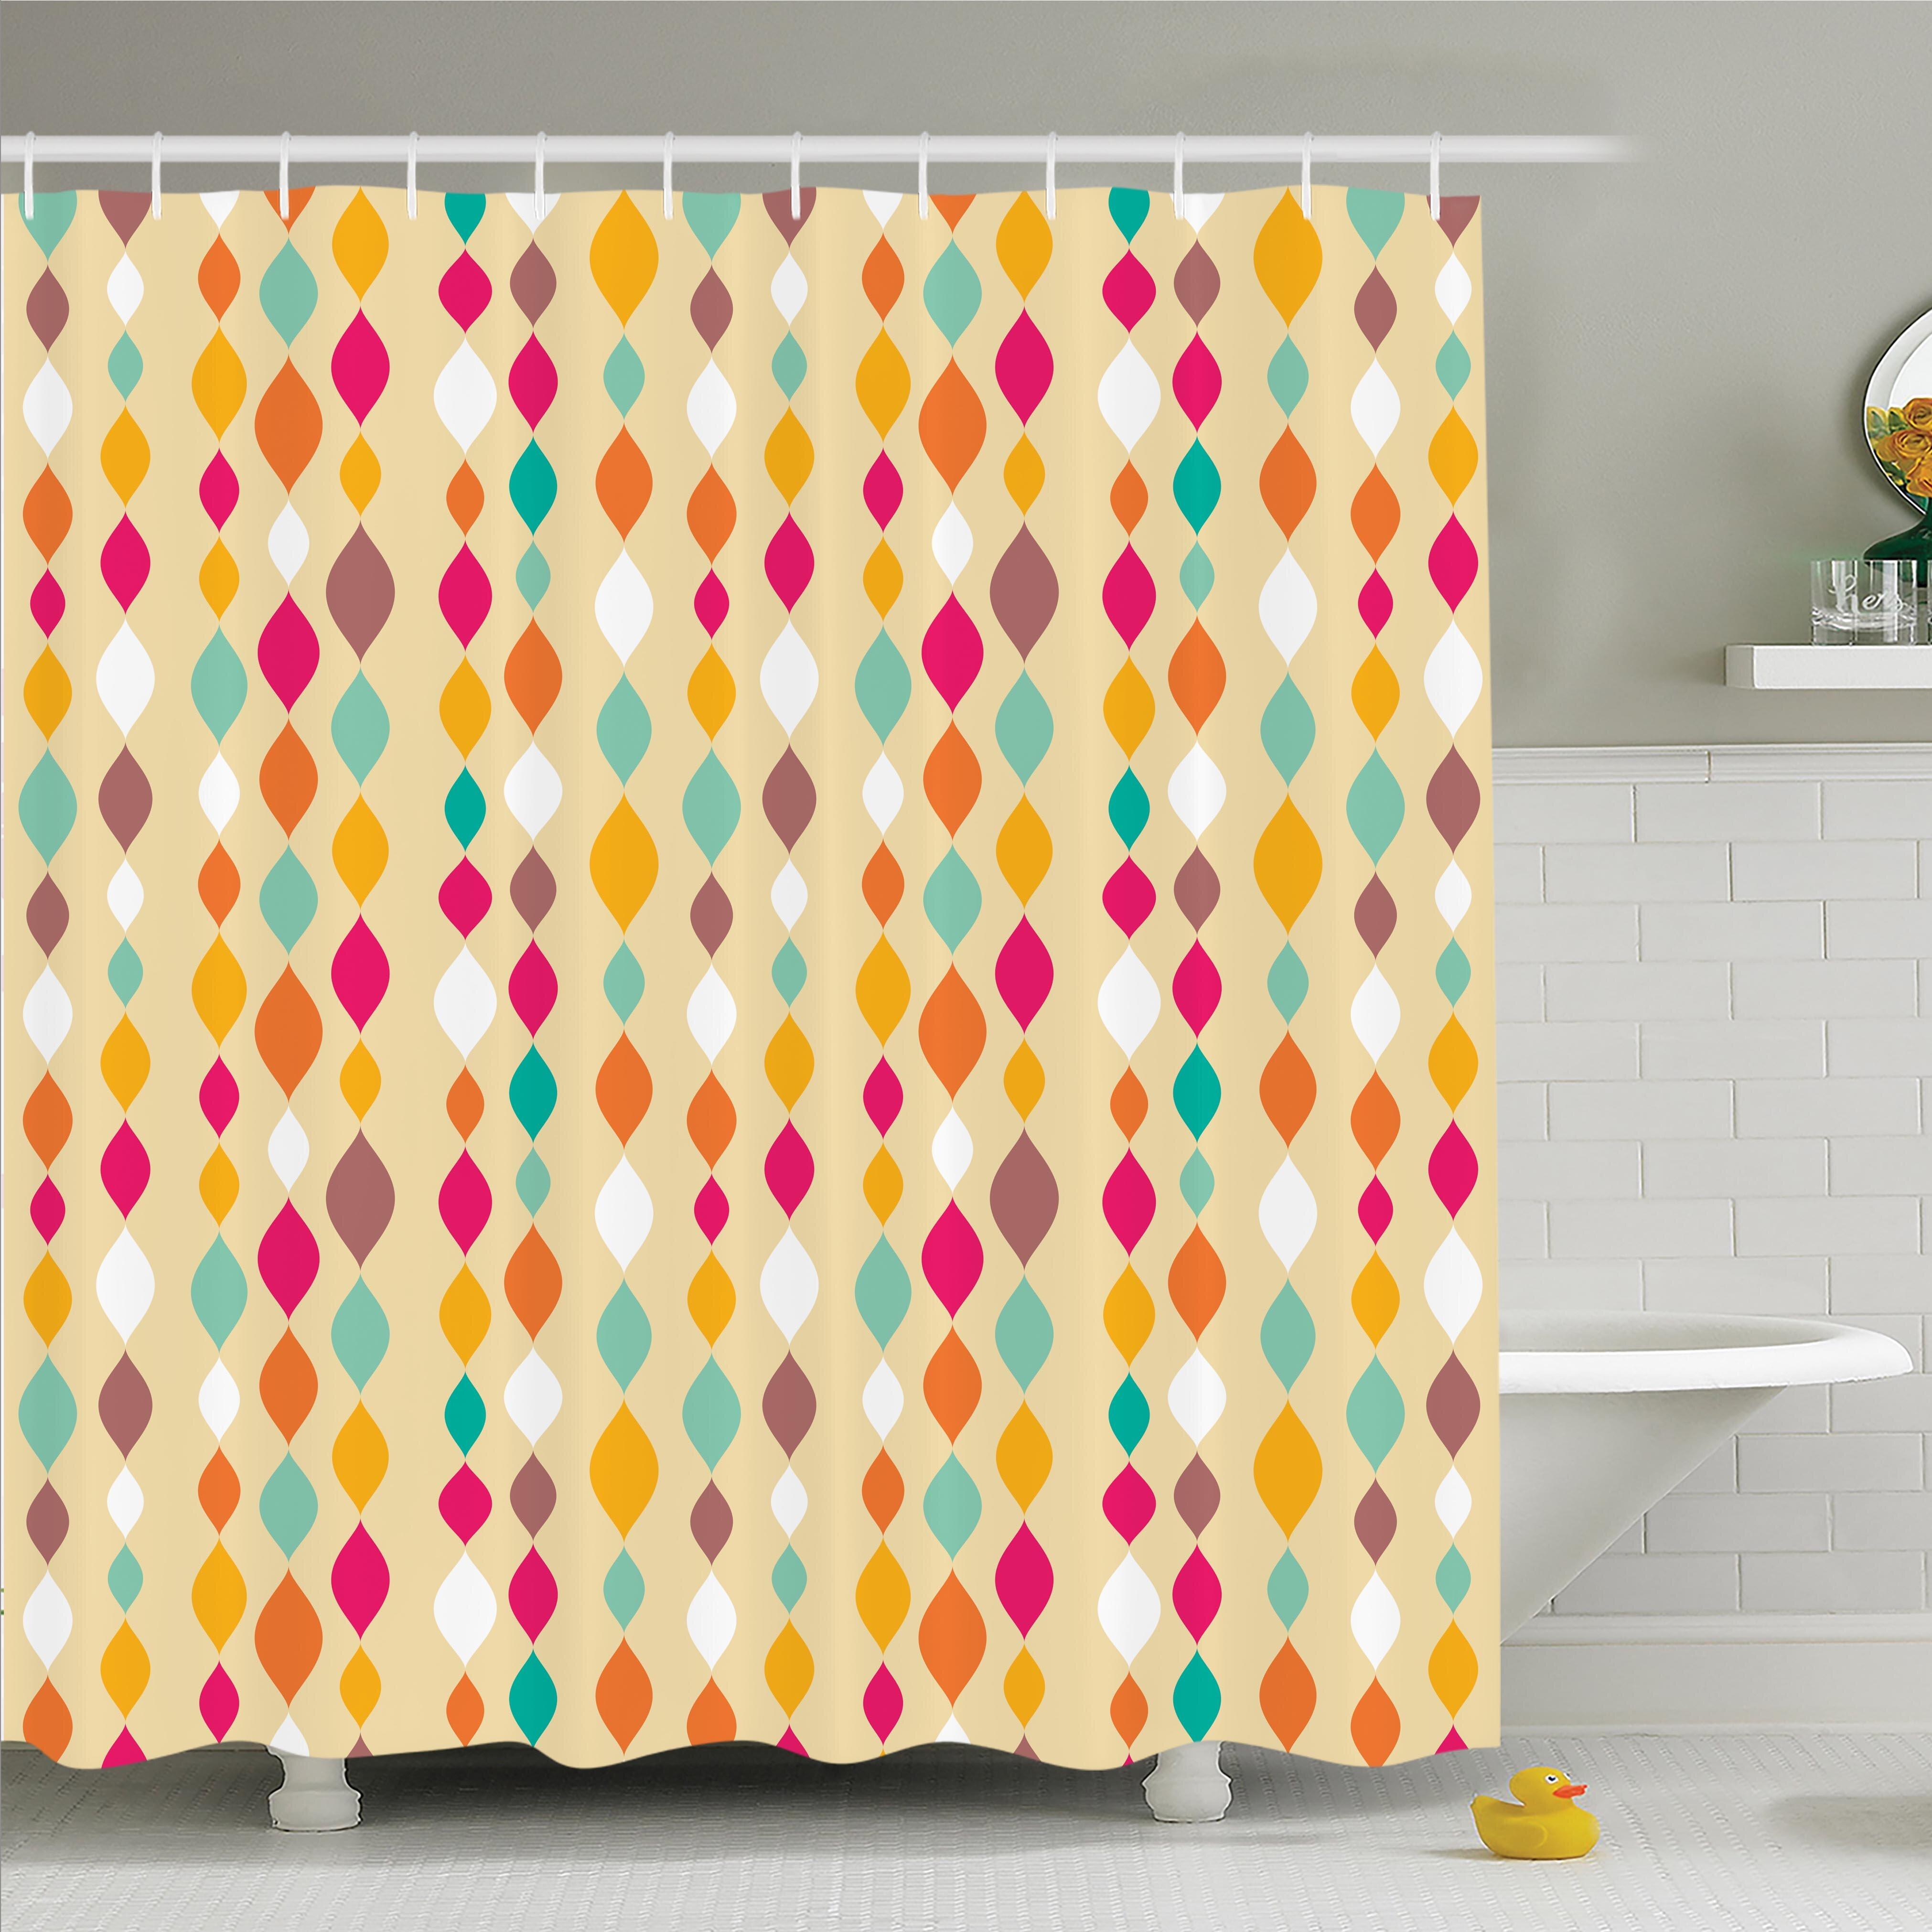 Vintage Retro Colorful Circles Shower Curtain Set